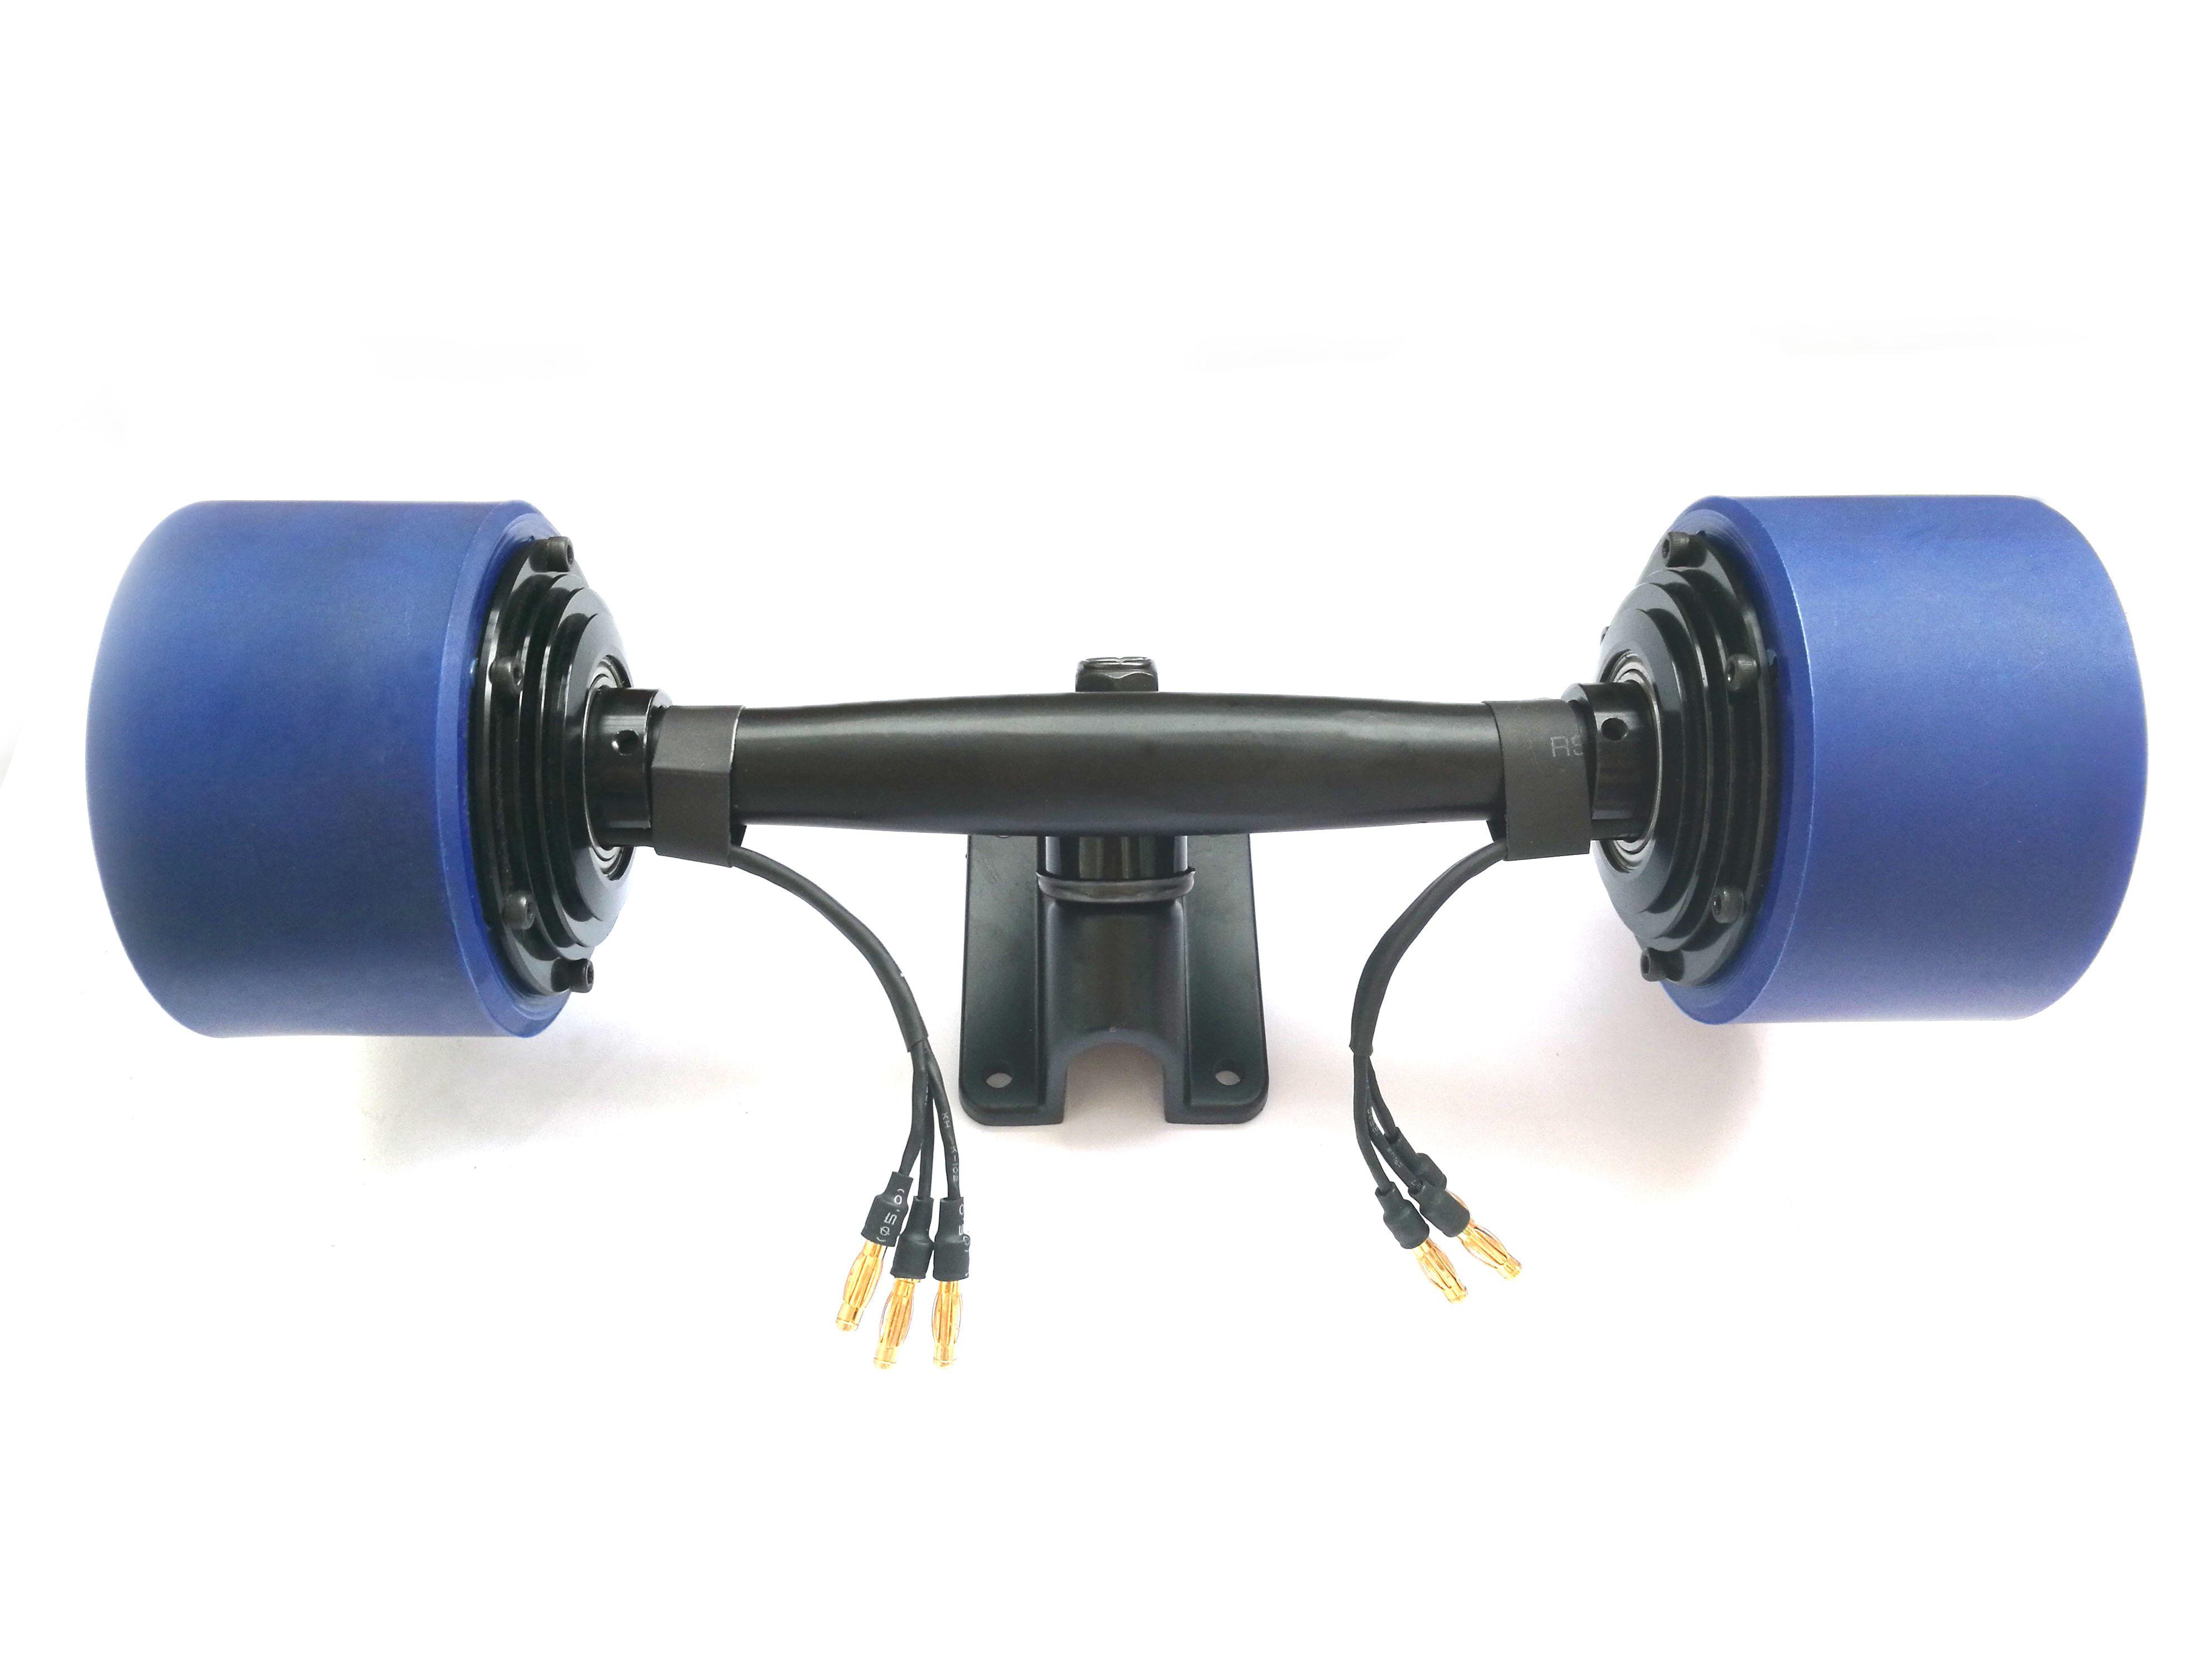 2018 dual hub motor kit for electric skateboard longboard. Black Bedroom Furniture Sets. Home Design Ideas